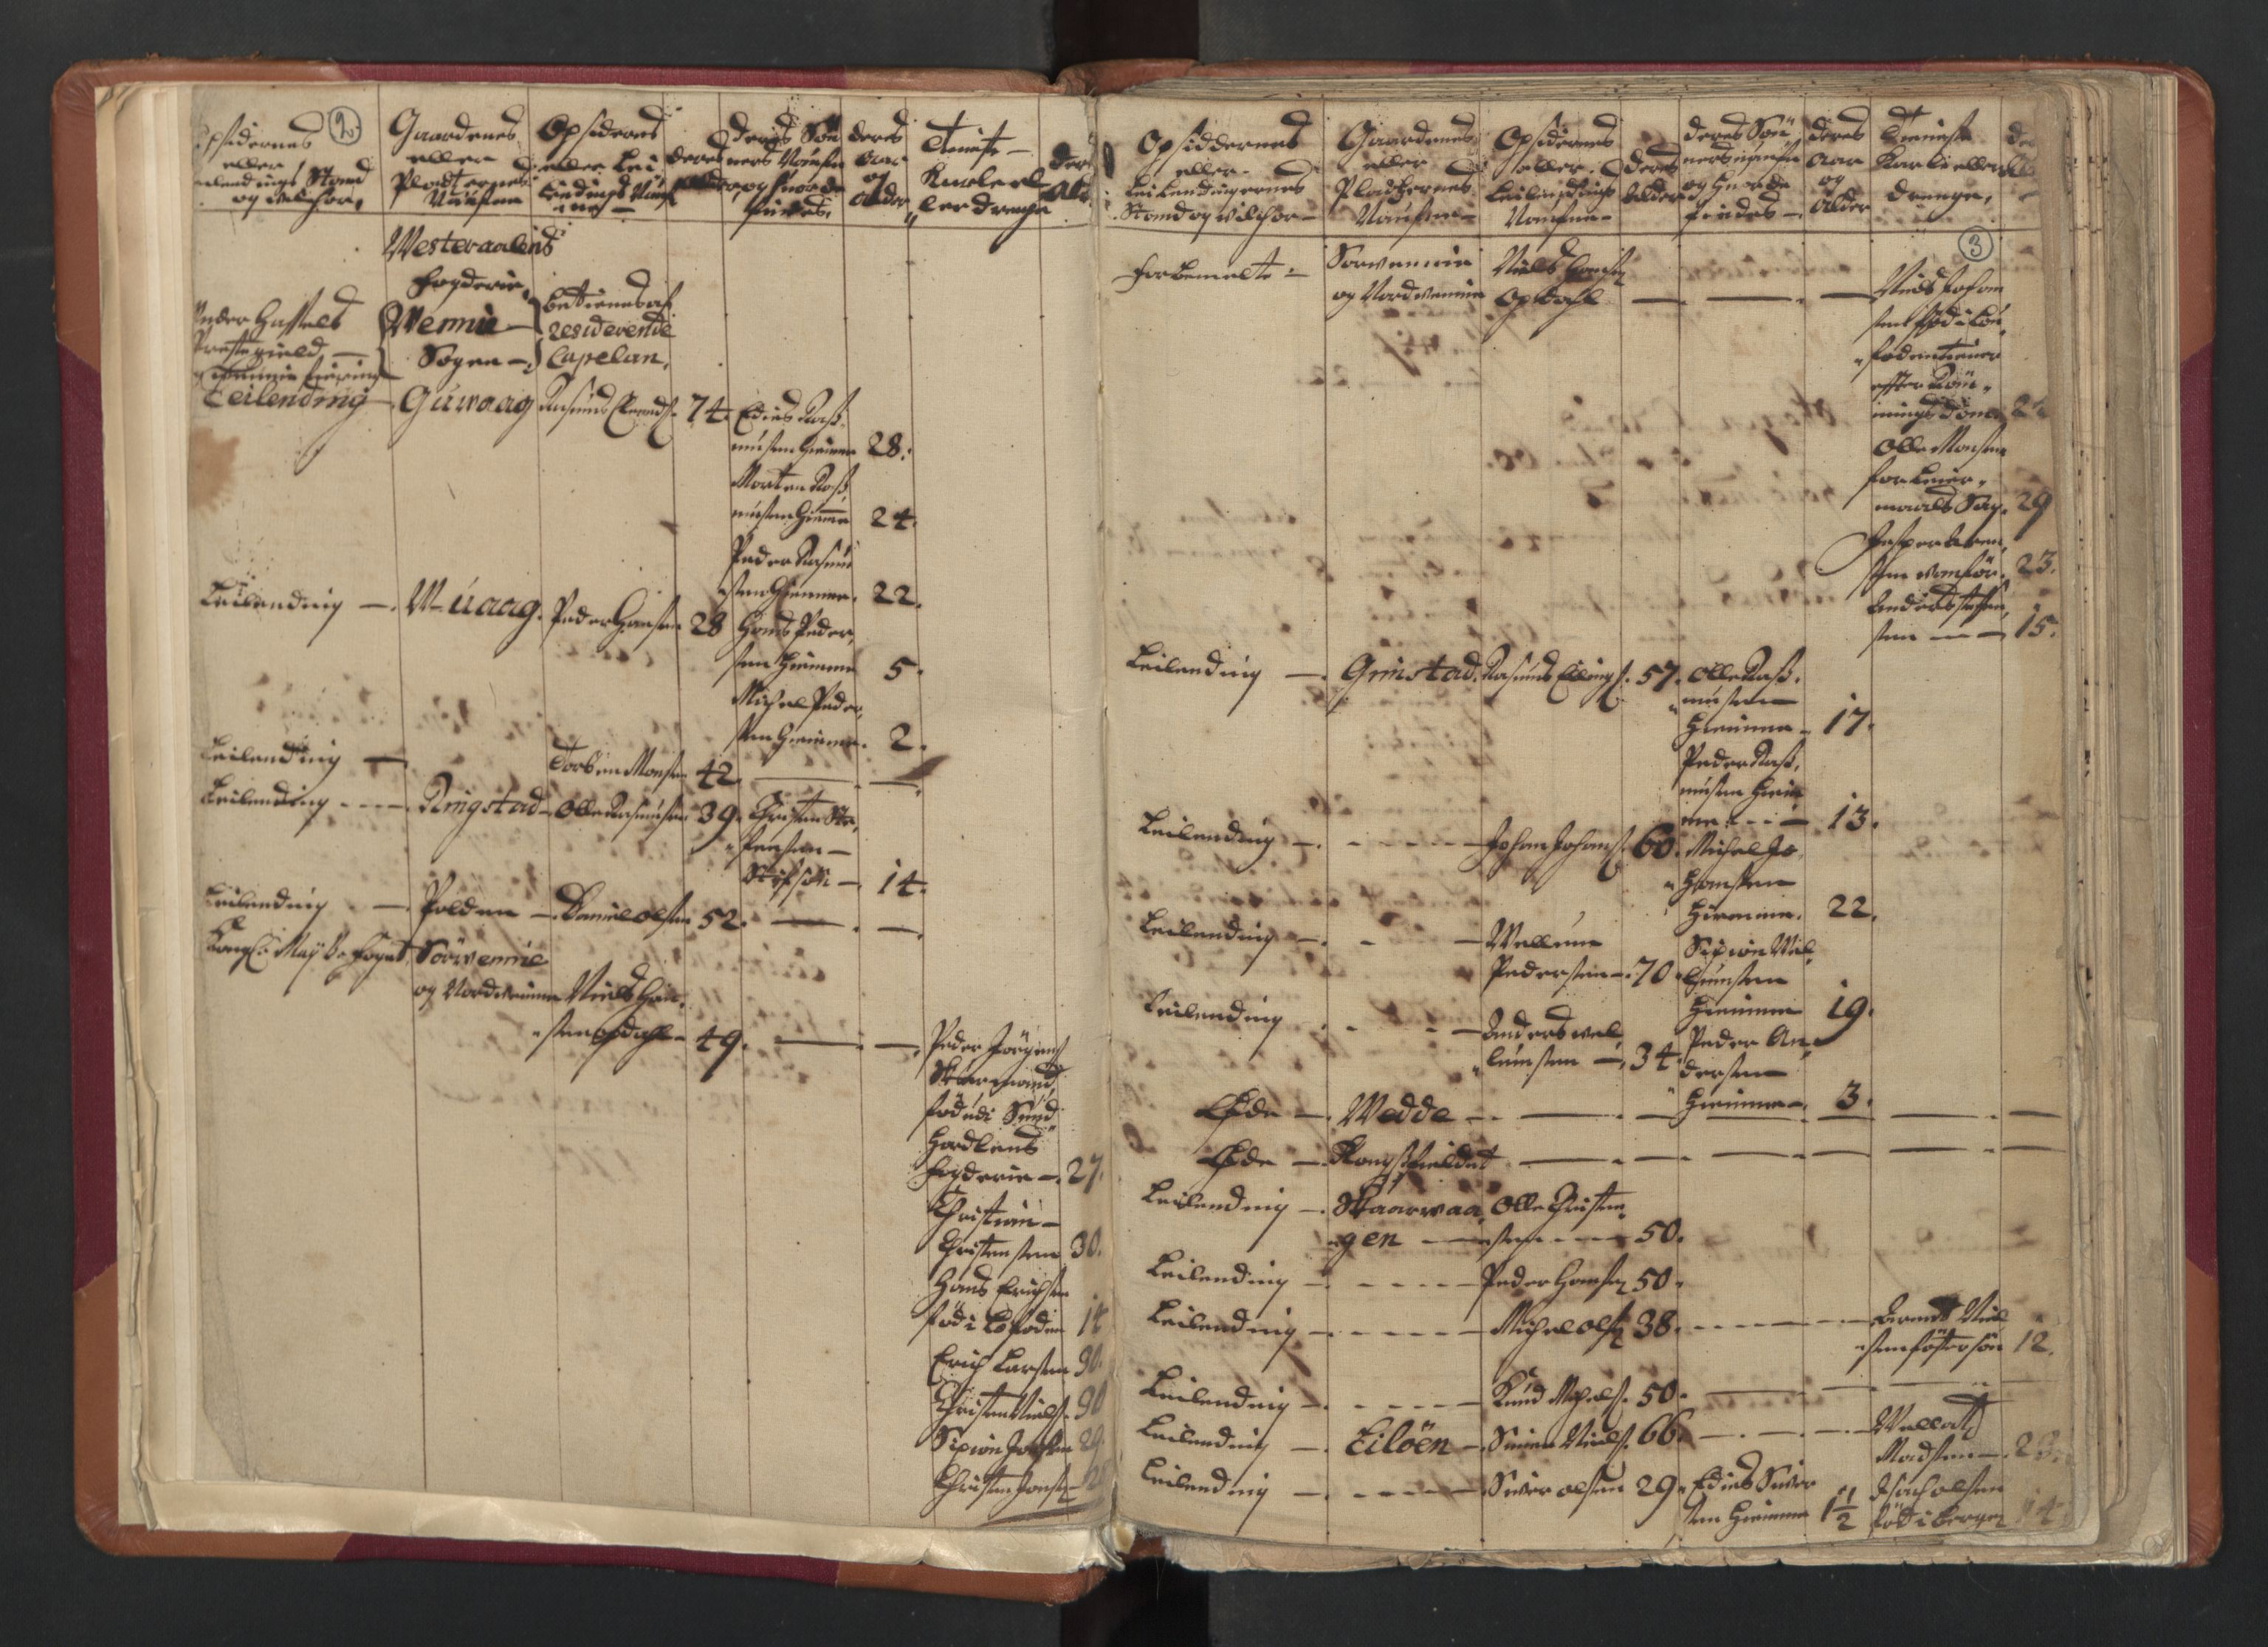 RA, Manntallet 1701, nr. 18: Vesterålen, Andenes og Lofoten fogderi, 1701, s. 2-3